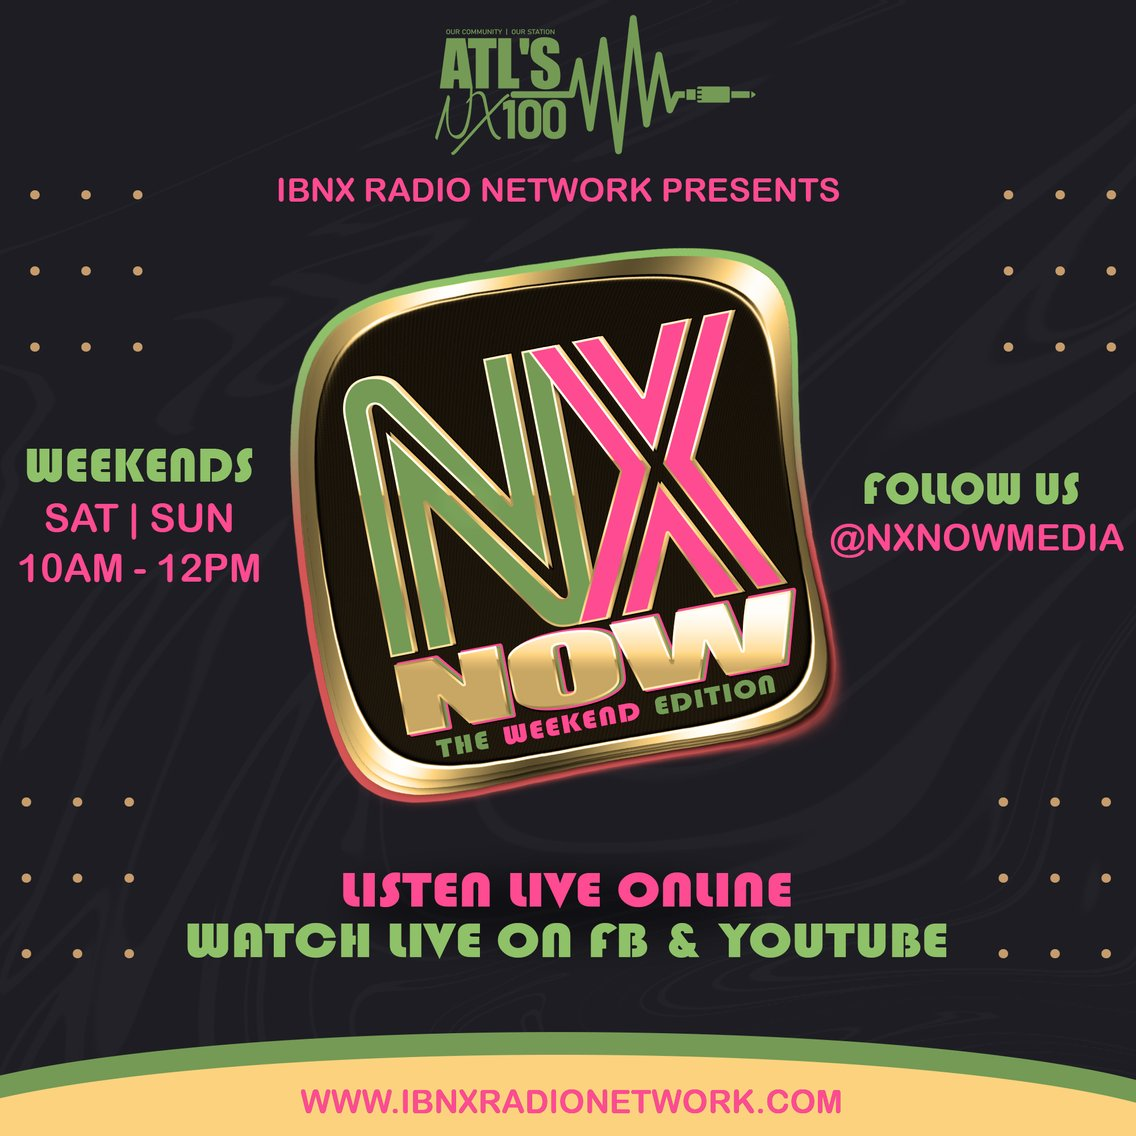 NXNow - immagine di copertina